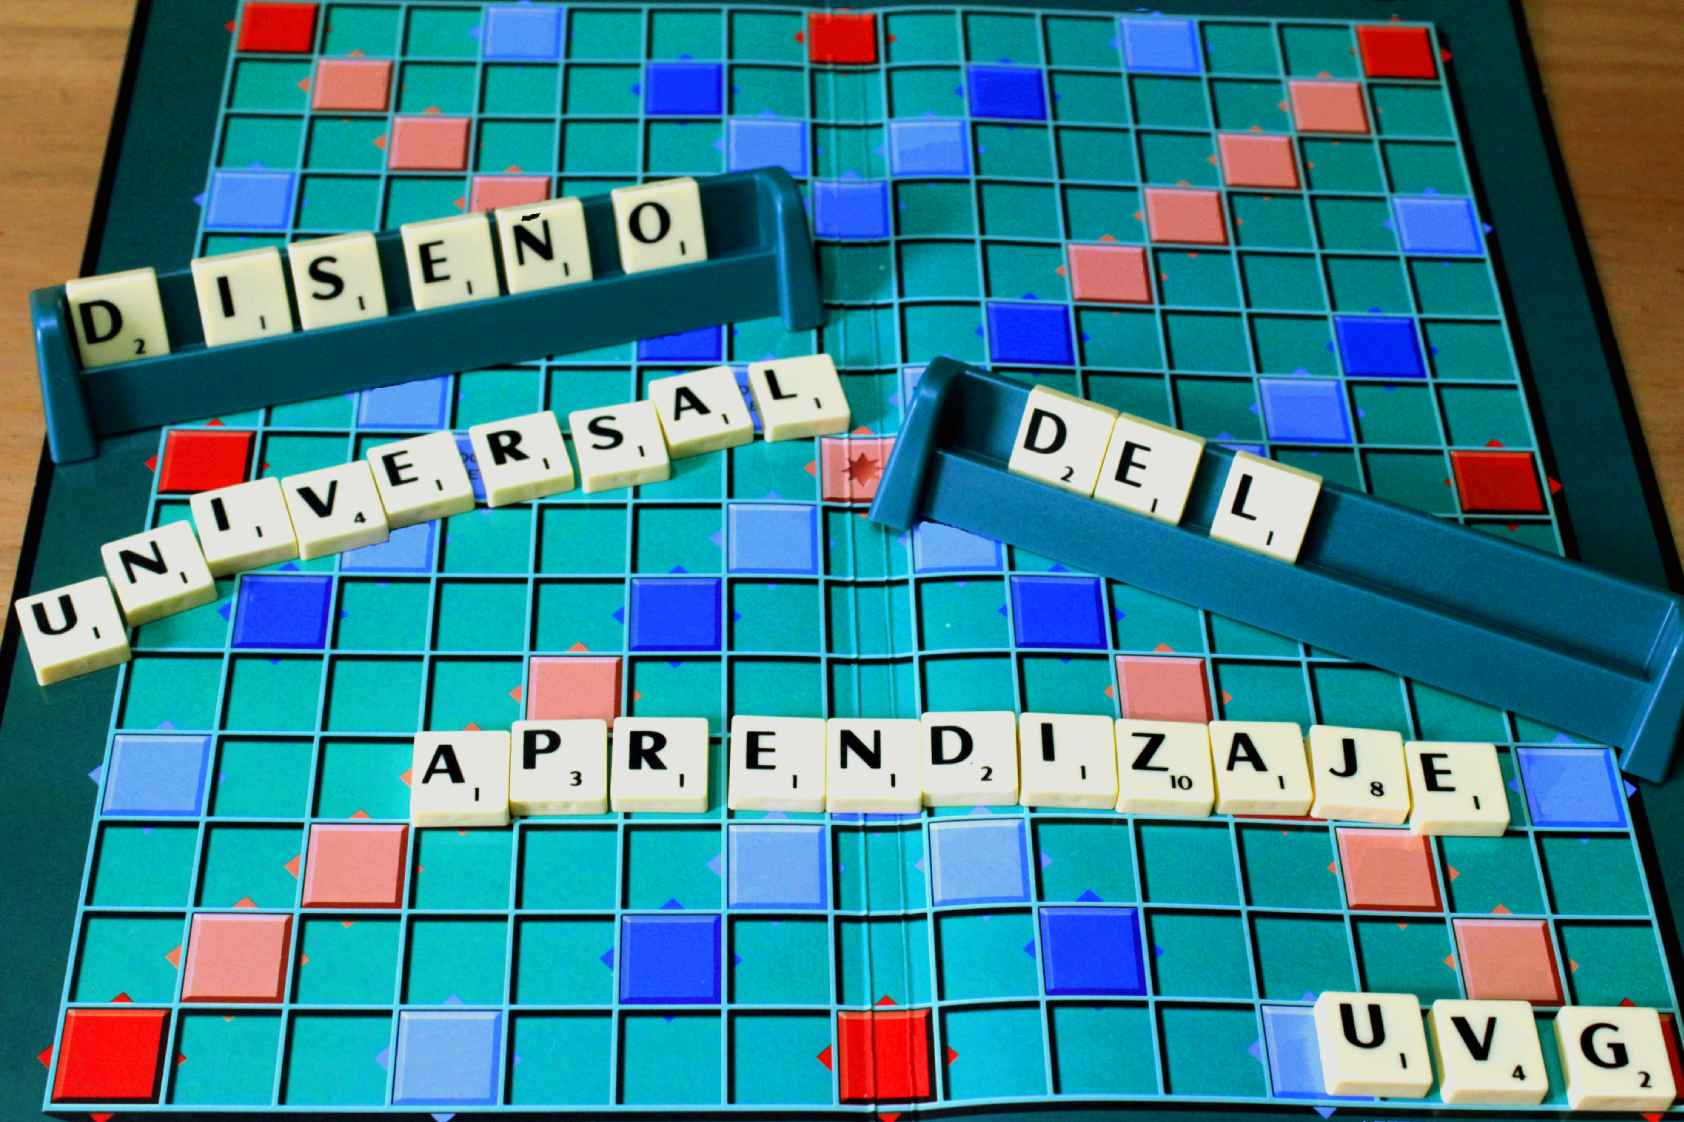 Diseño universal del aprendizaje, la experiencia argentina